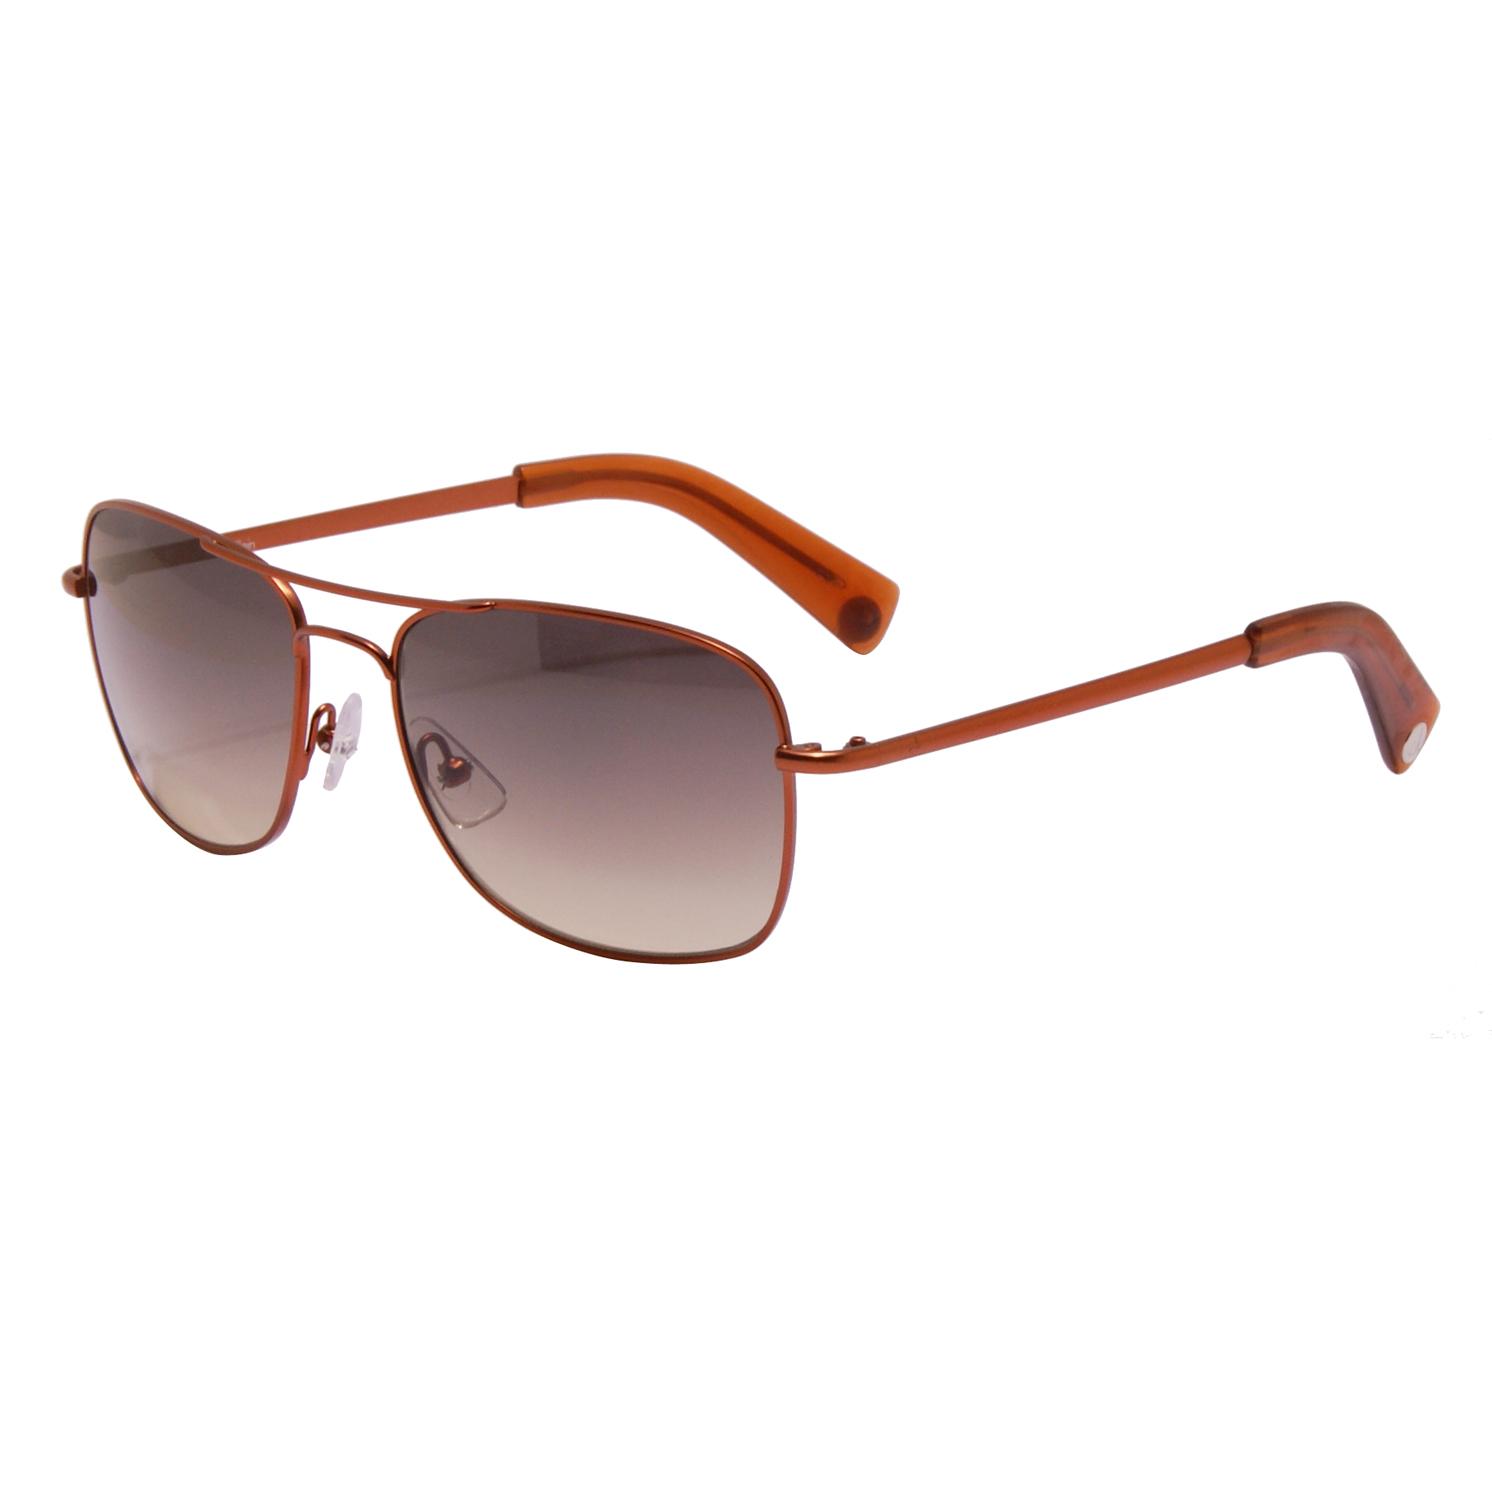 Calvin Klein CK – Bronze/Copper Classic Sunglasses